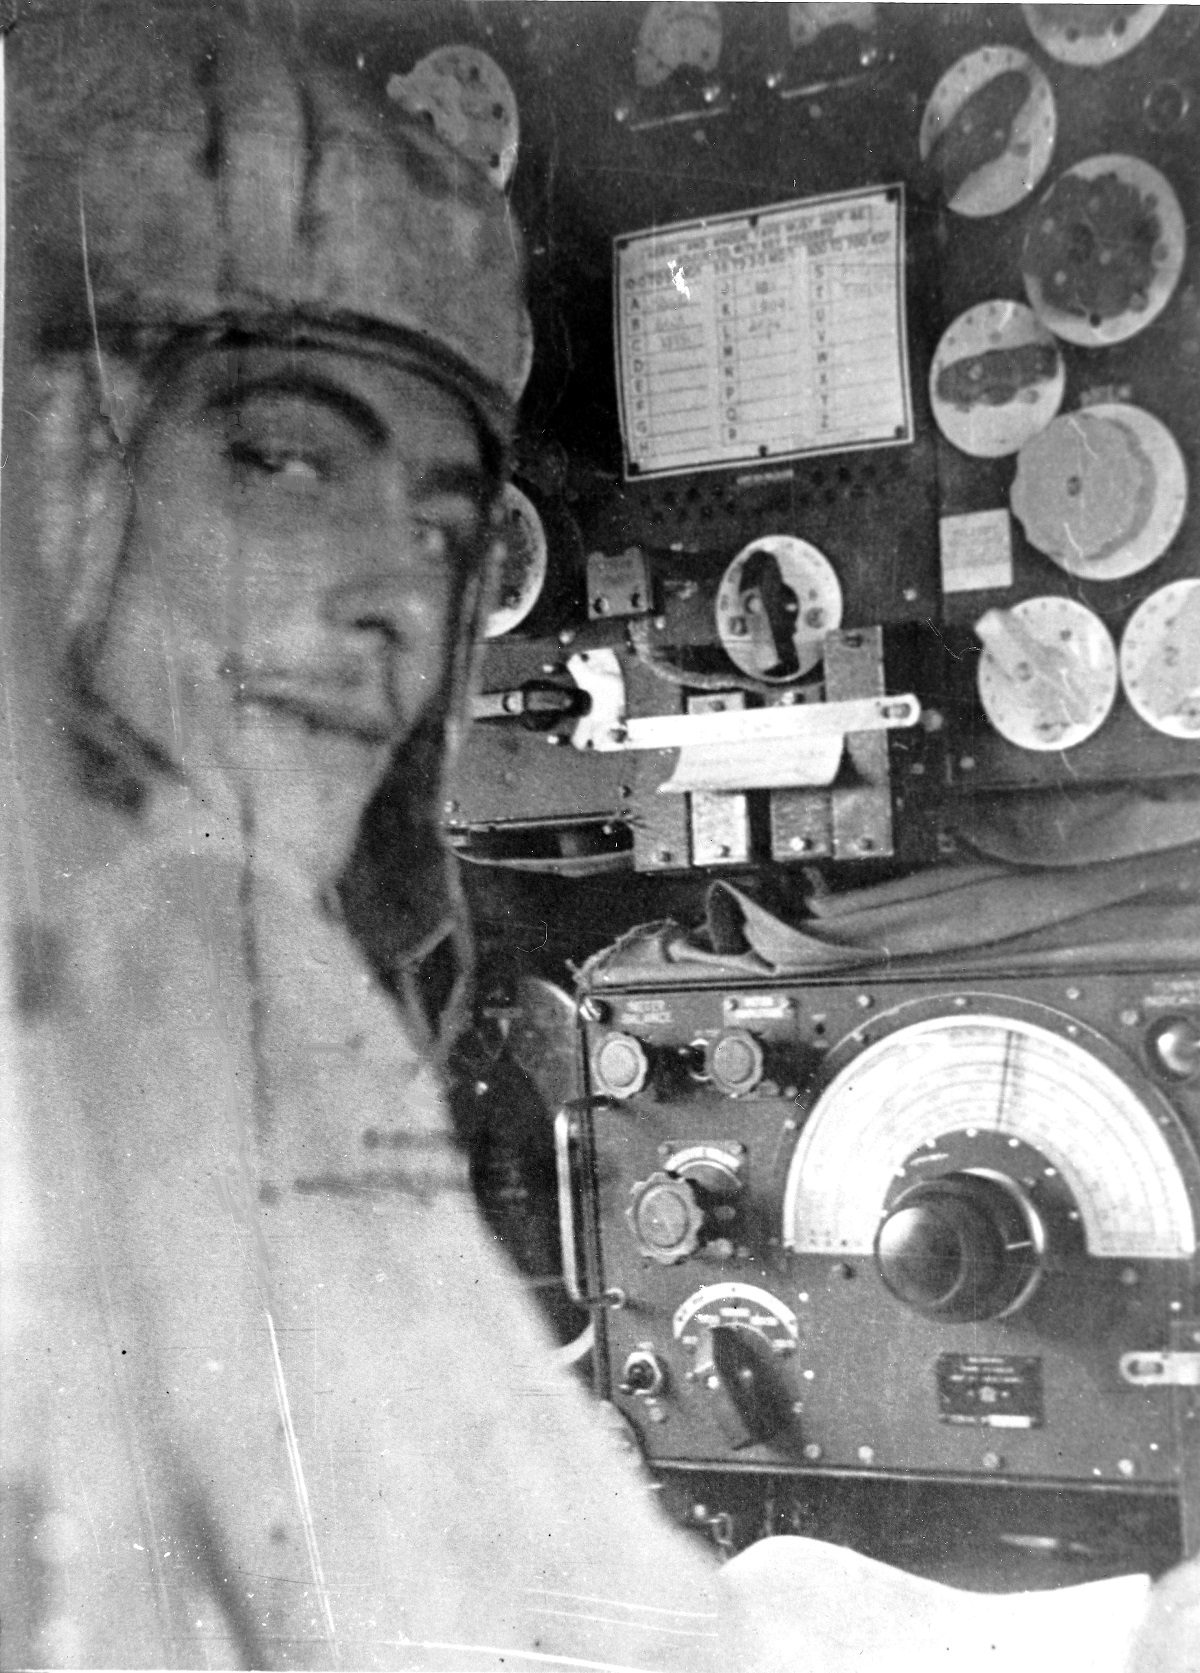 [ Aéronavale divers ] Radios volants, Radbo, Elbor, etc... - Page 2 22204_10